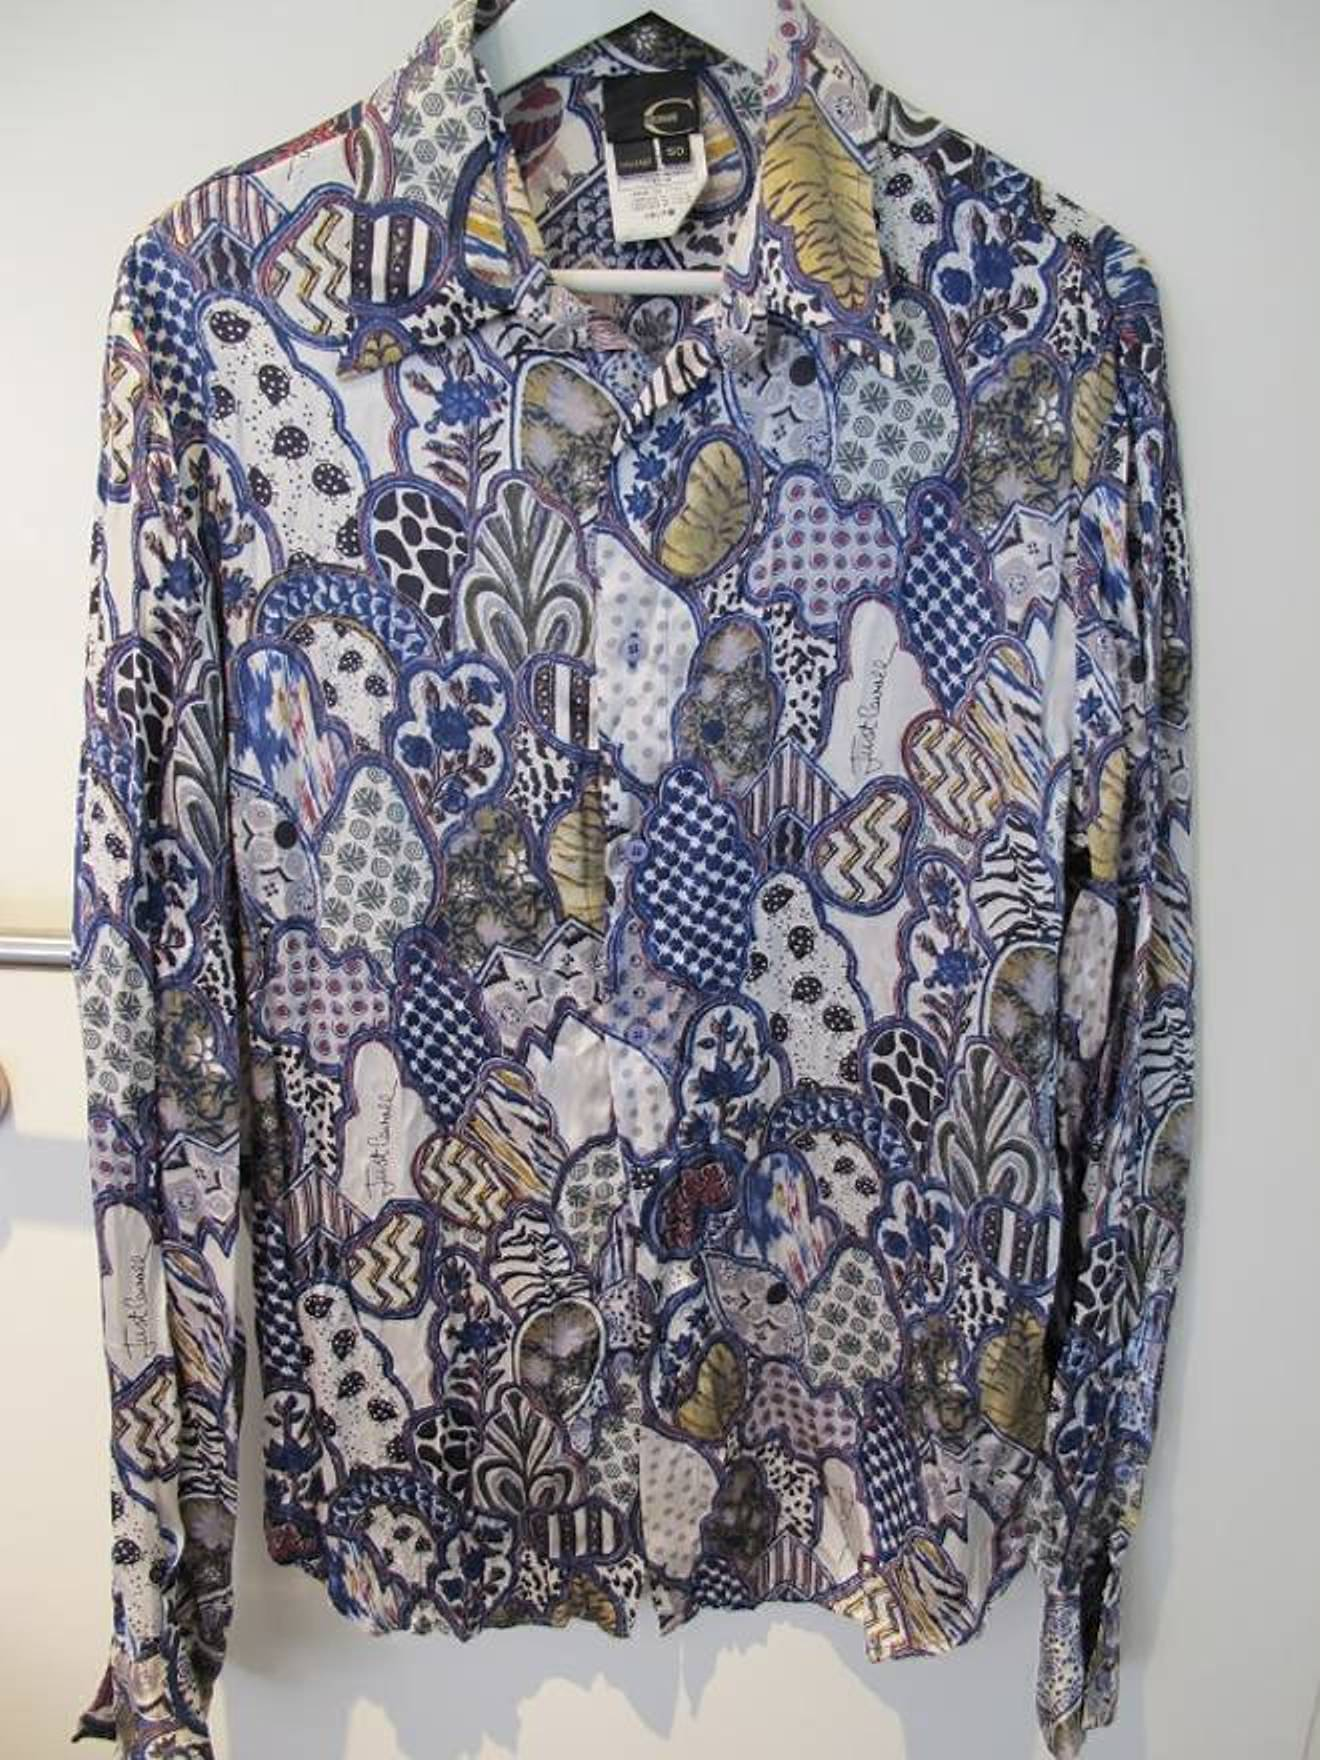 Just Cavalli Cavalli Silk Floral Print Shirt Size M Shirts Button